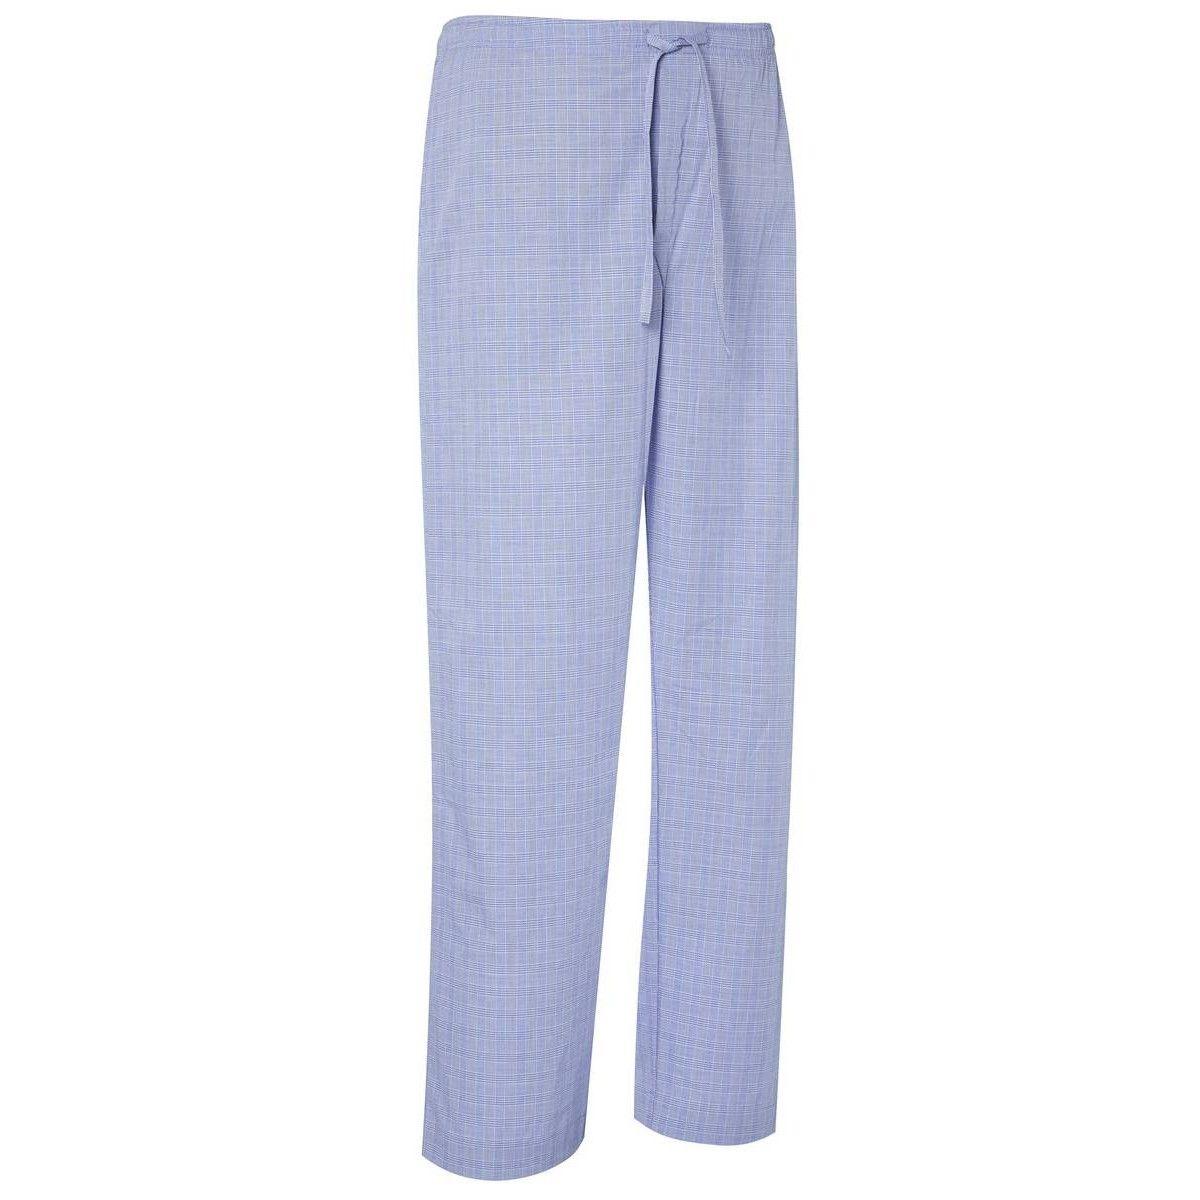 Derek Rose Felsted 3 Lounge Trousers - Blue | Blue Derek Rose Lounge Trousers | KJ Beckett